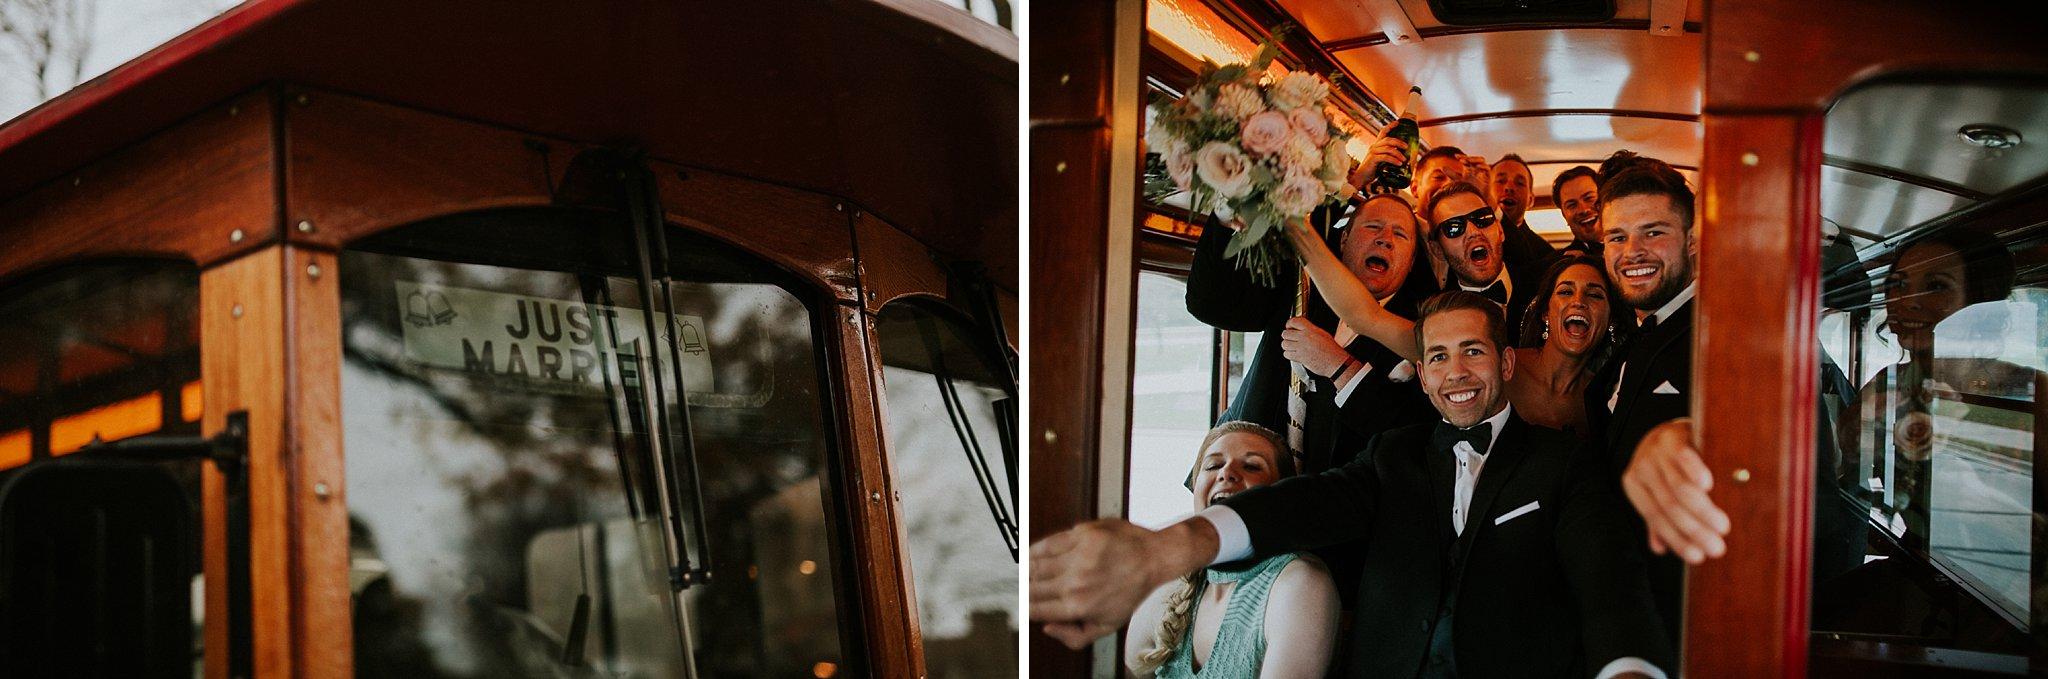 Matt-Lauren_St-Marys_Hilton-City-Center-Milwaukee-Wedding_liller-photo_0052.jpg